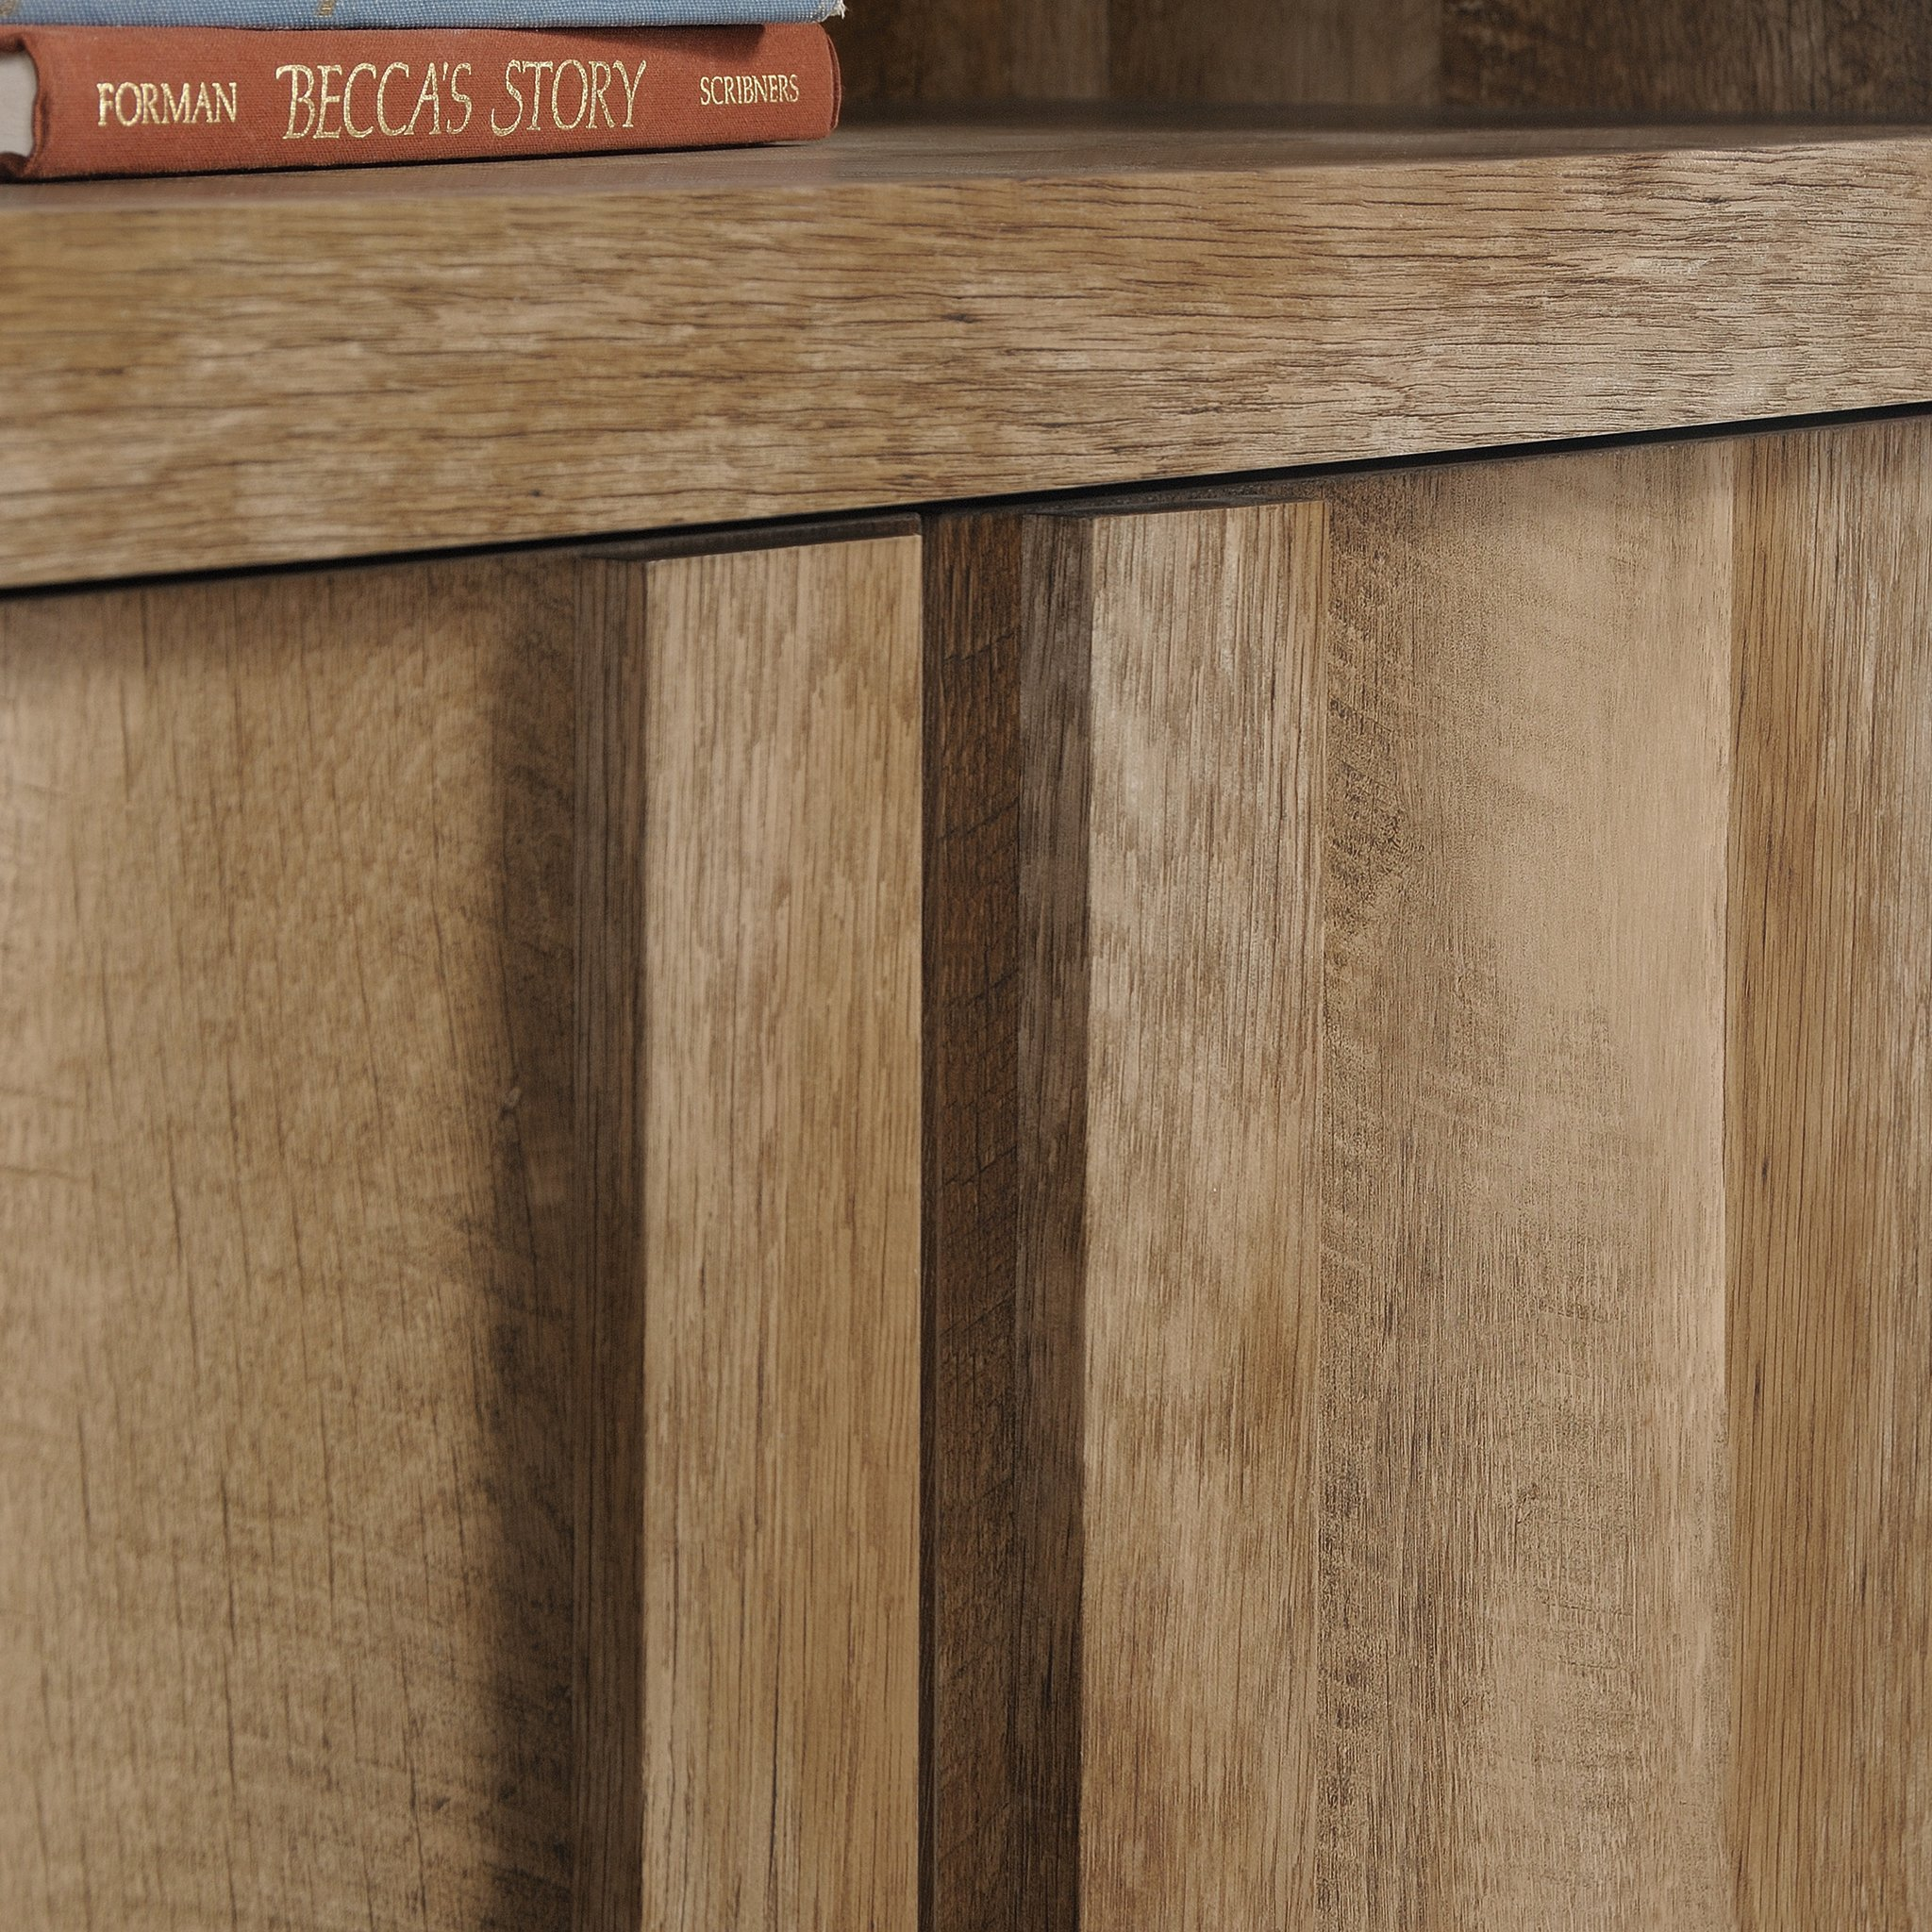 Sauder 420409 Dakota Pass Library with Doors, L: 33.82'' x W: 12.52'' x H: 71.10'', Craftsman Oak Finish by Sauder (Image #7)